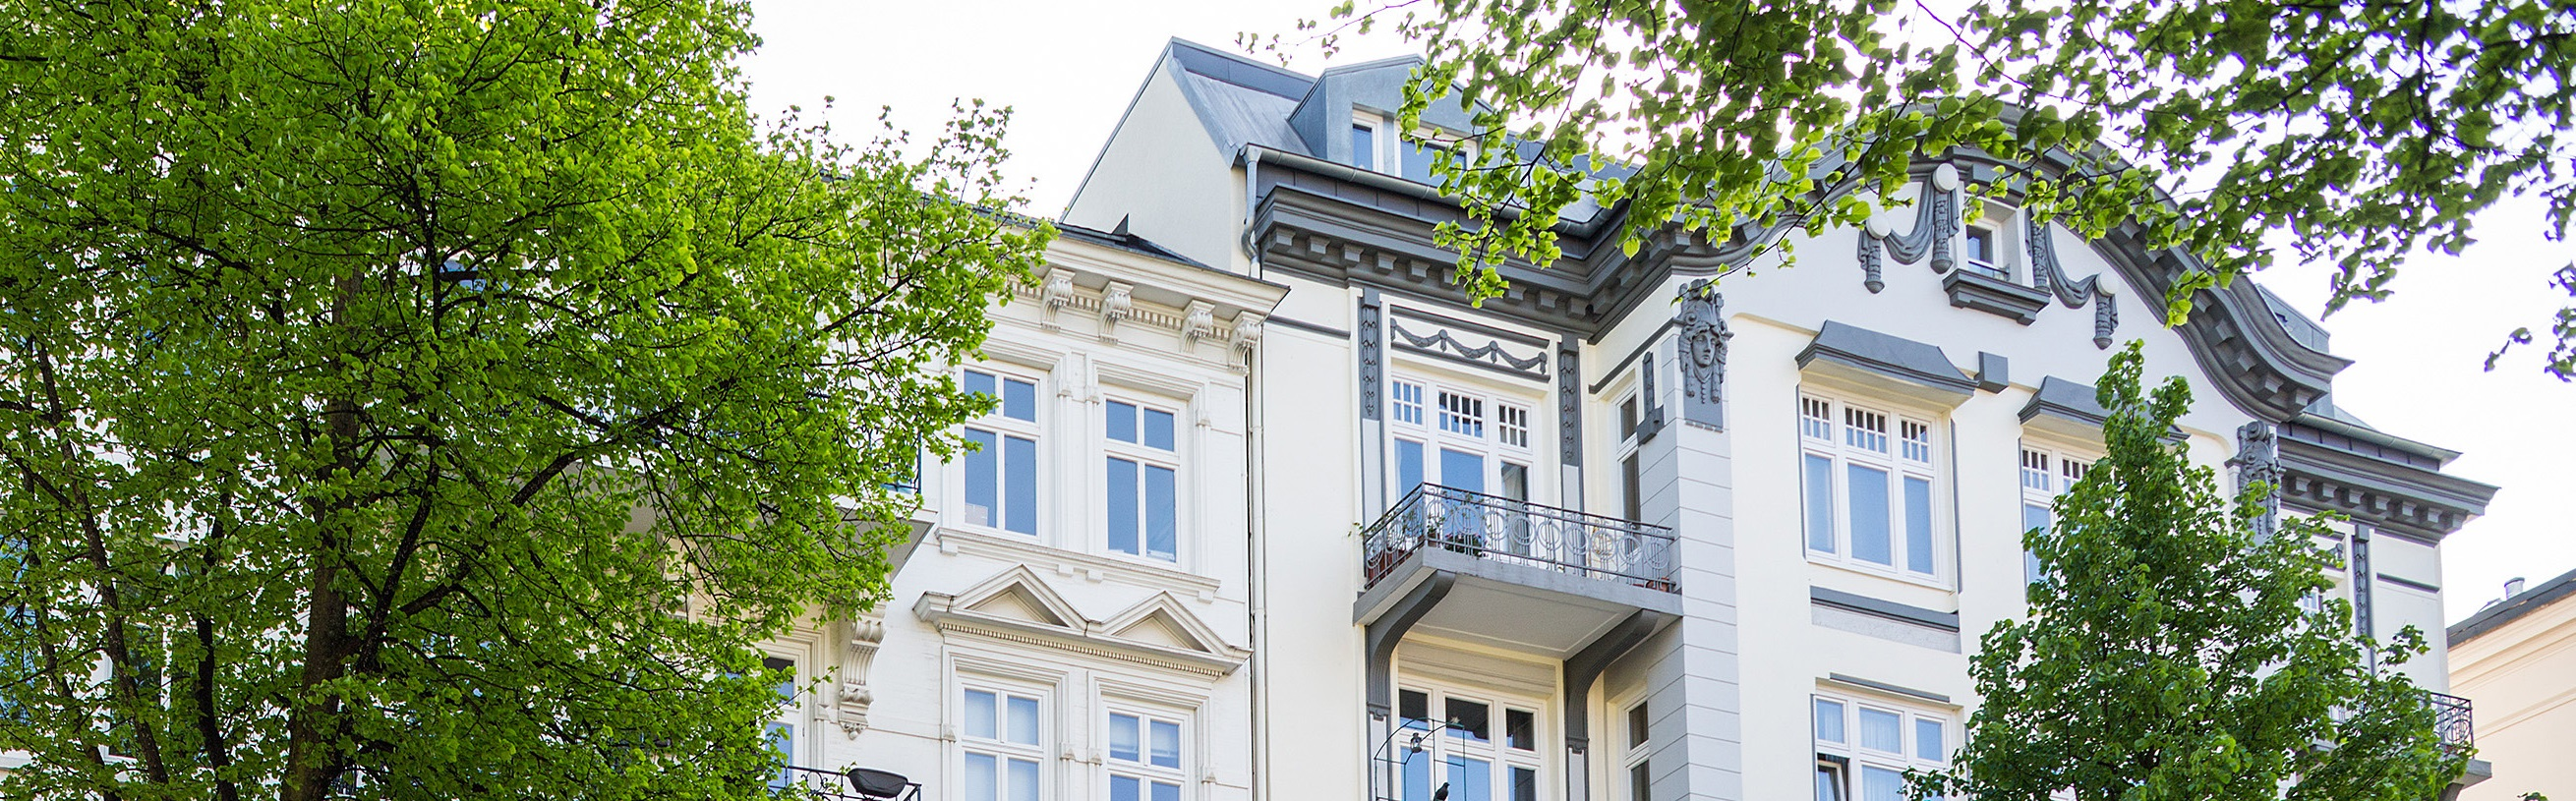 immobilien in hamburg eppendorf harvestehude rotherbaum. Black Bedroom Furniture Sets. Home Design Ideas